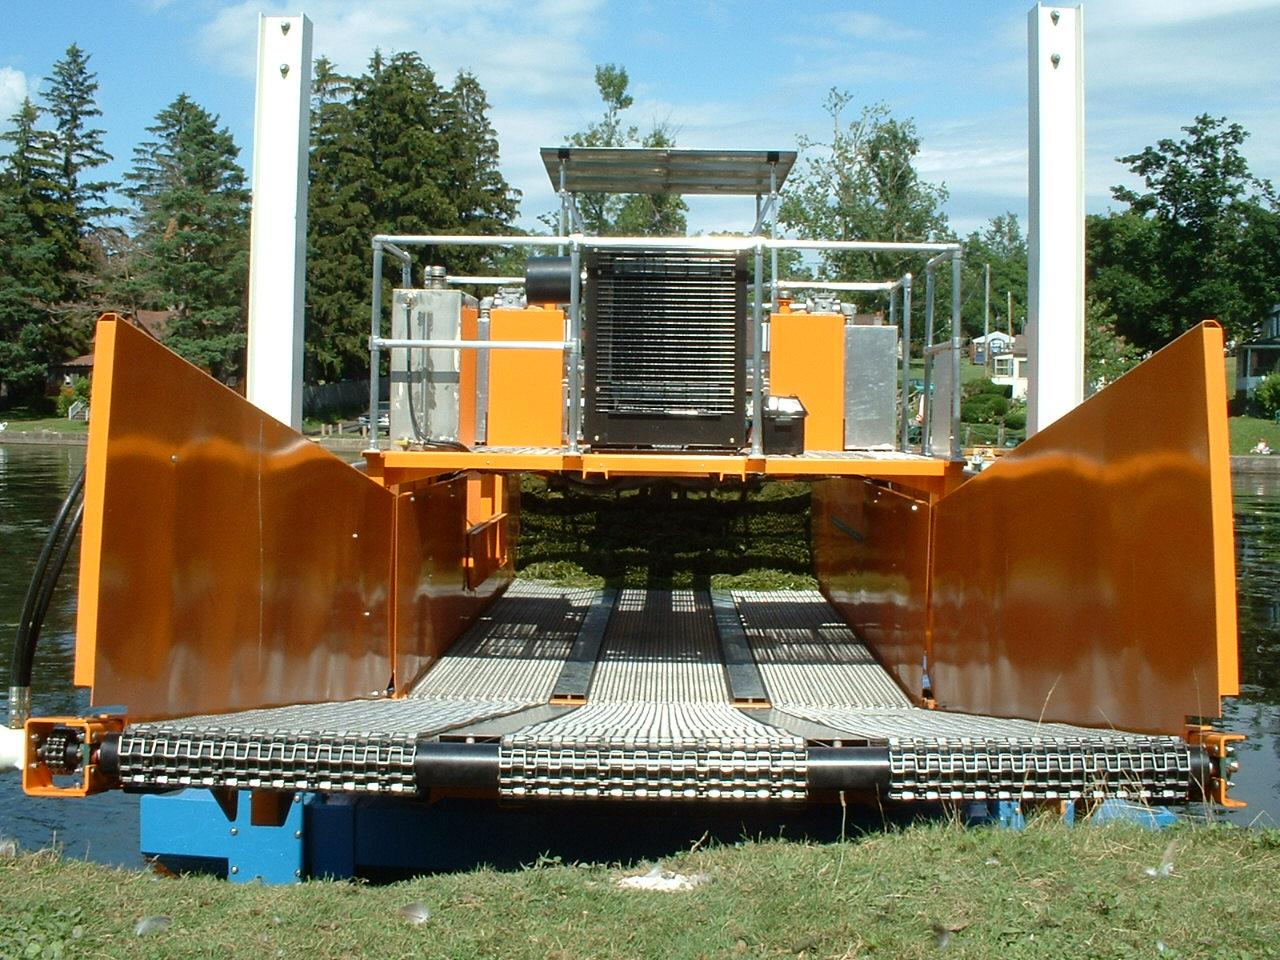 Alphaboats FX-11 Waterweed Harvester rear discharge conveyor